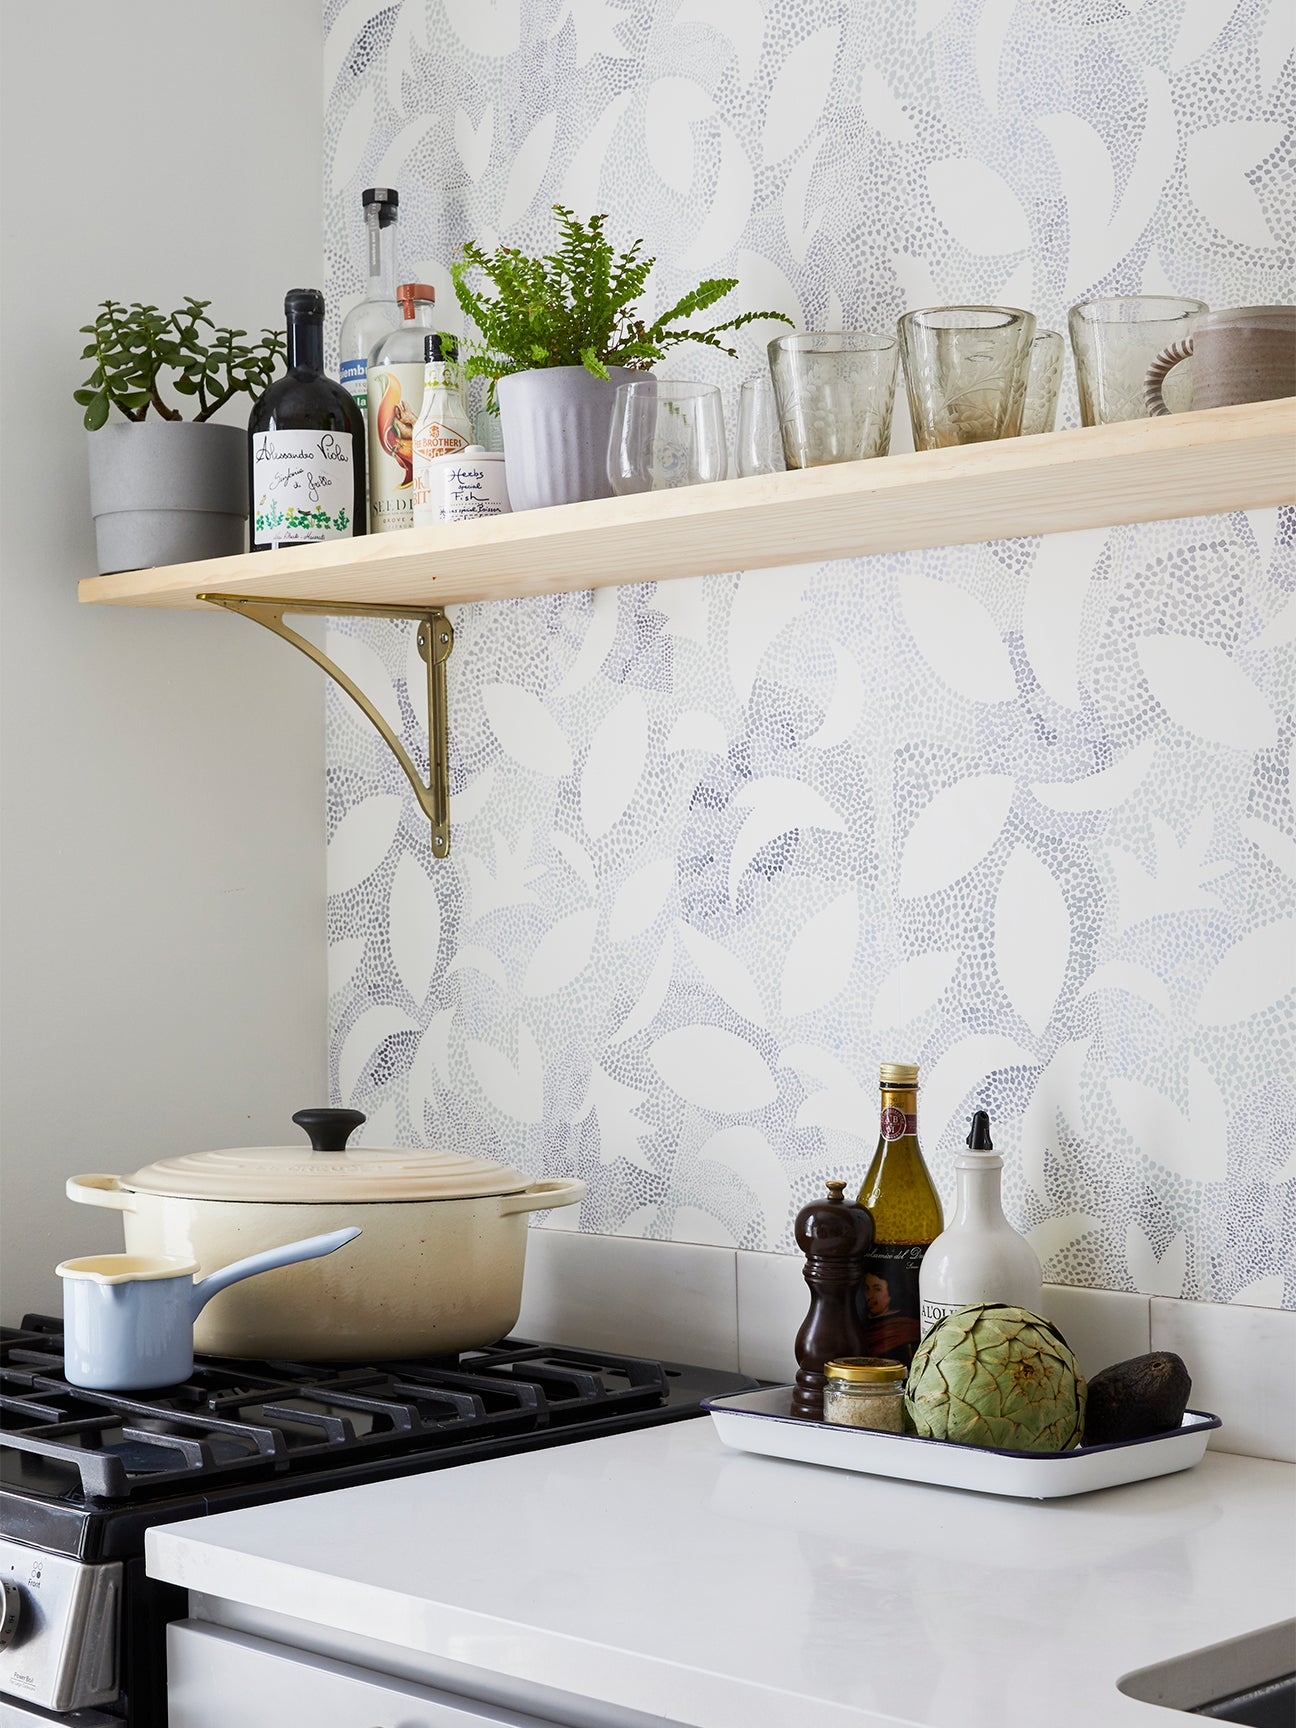 7 Kitchen Wallpaper Ideas That'll Inspire a Bold ...